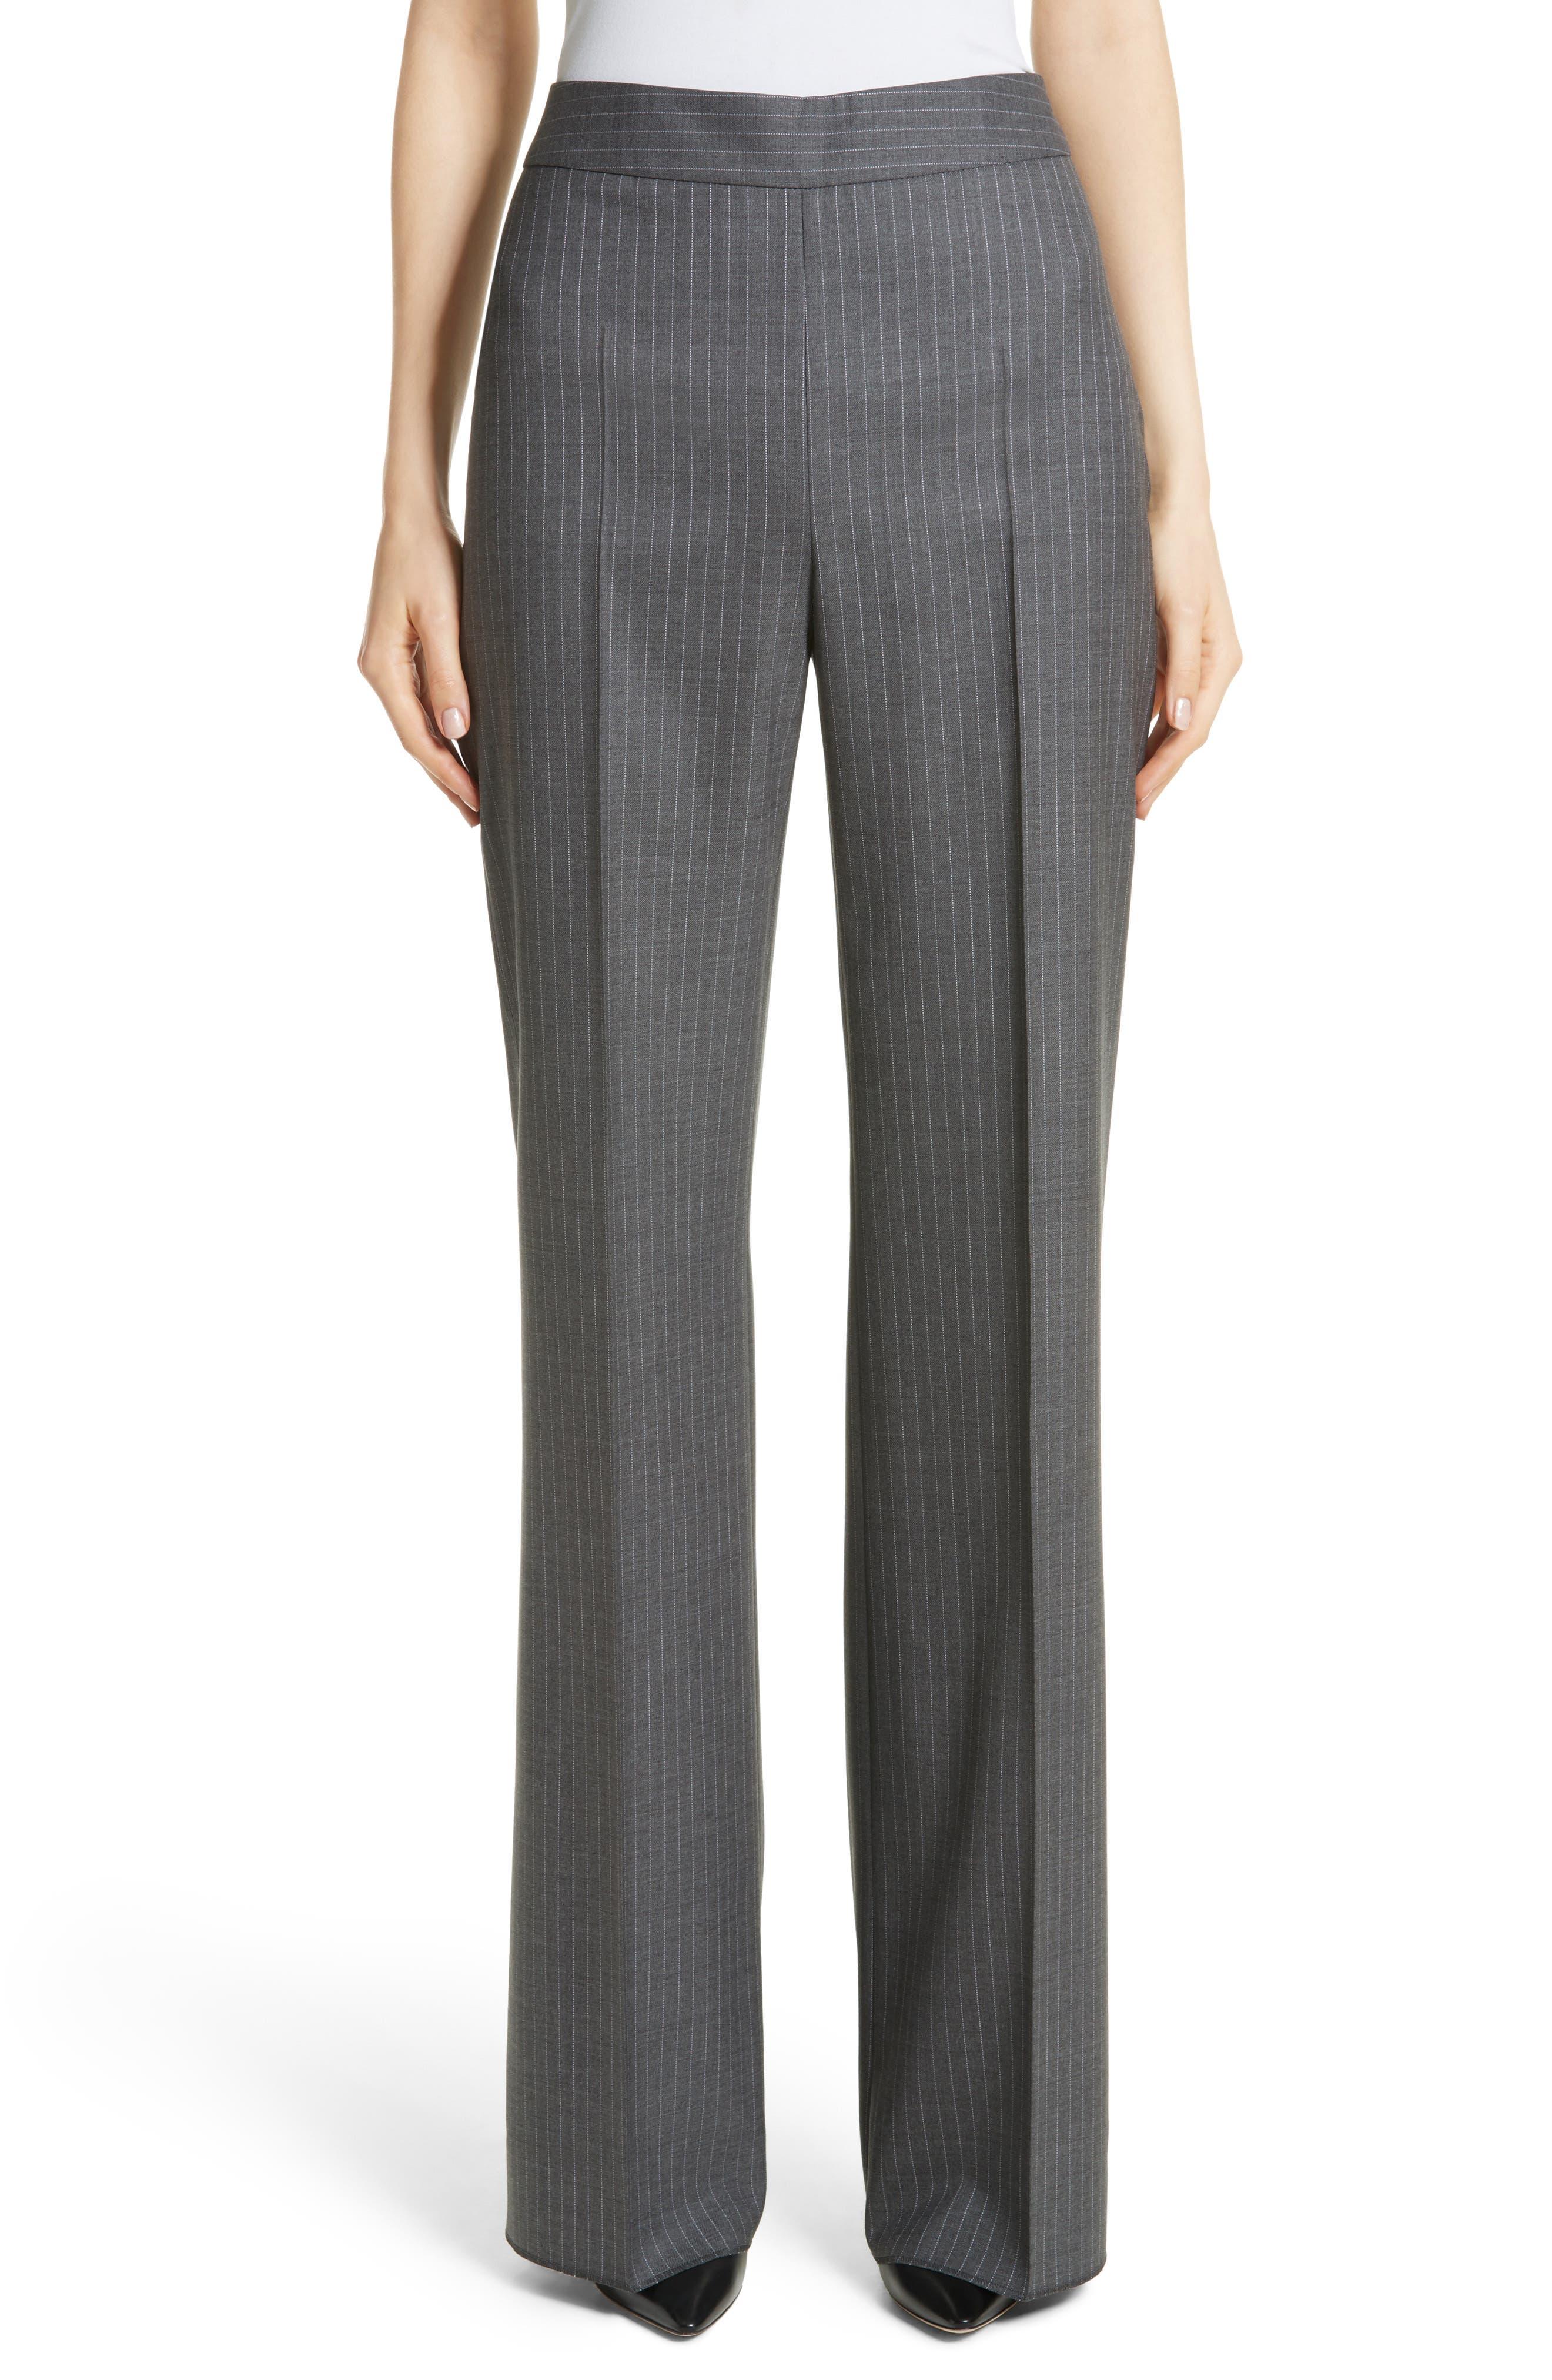 Garibo Stretch Wool Pinstripe Pants,                         Main,                         color,